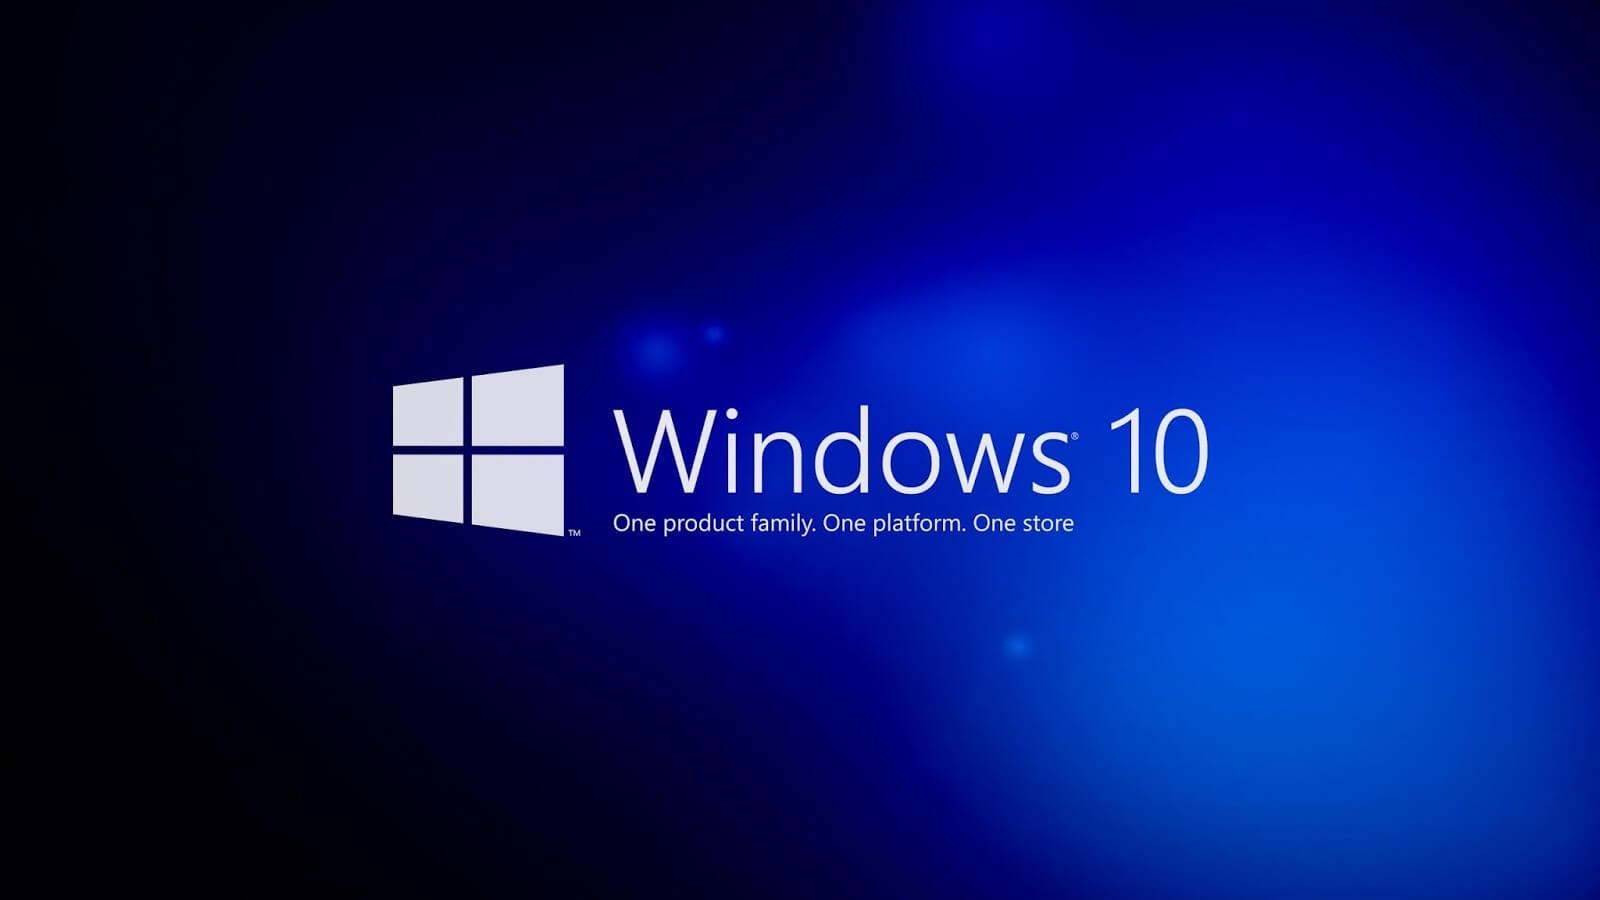 Download Windows 10 Full ISO bản chính thức từ Microsoft Google Drive Link - Download Windows 10 Full ISO bản chính thức từ Microsoft (Google Drive Link)